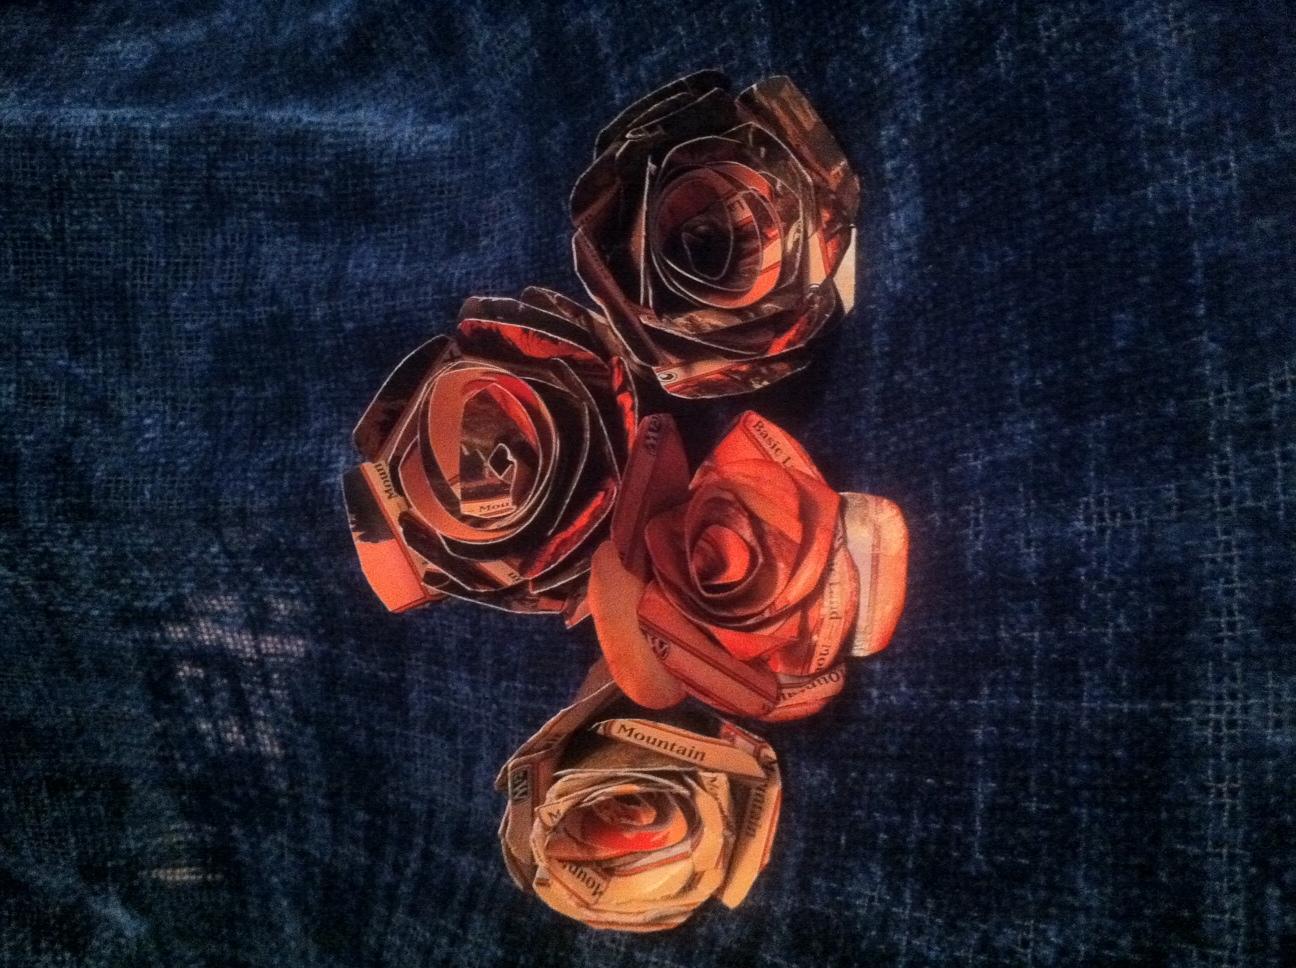 Flowers & Decor, red, Flowers, The, Magic, Gathering, Nerd